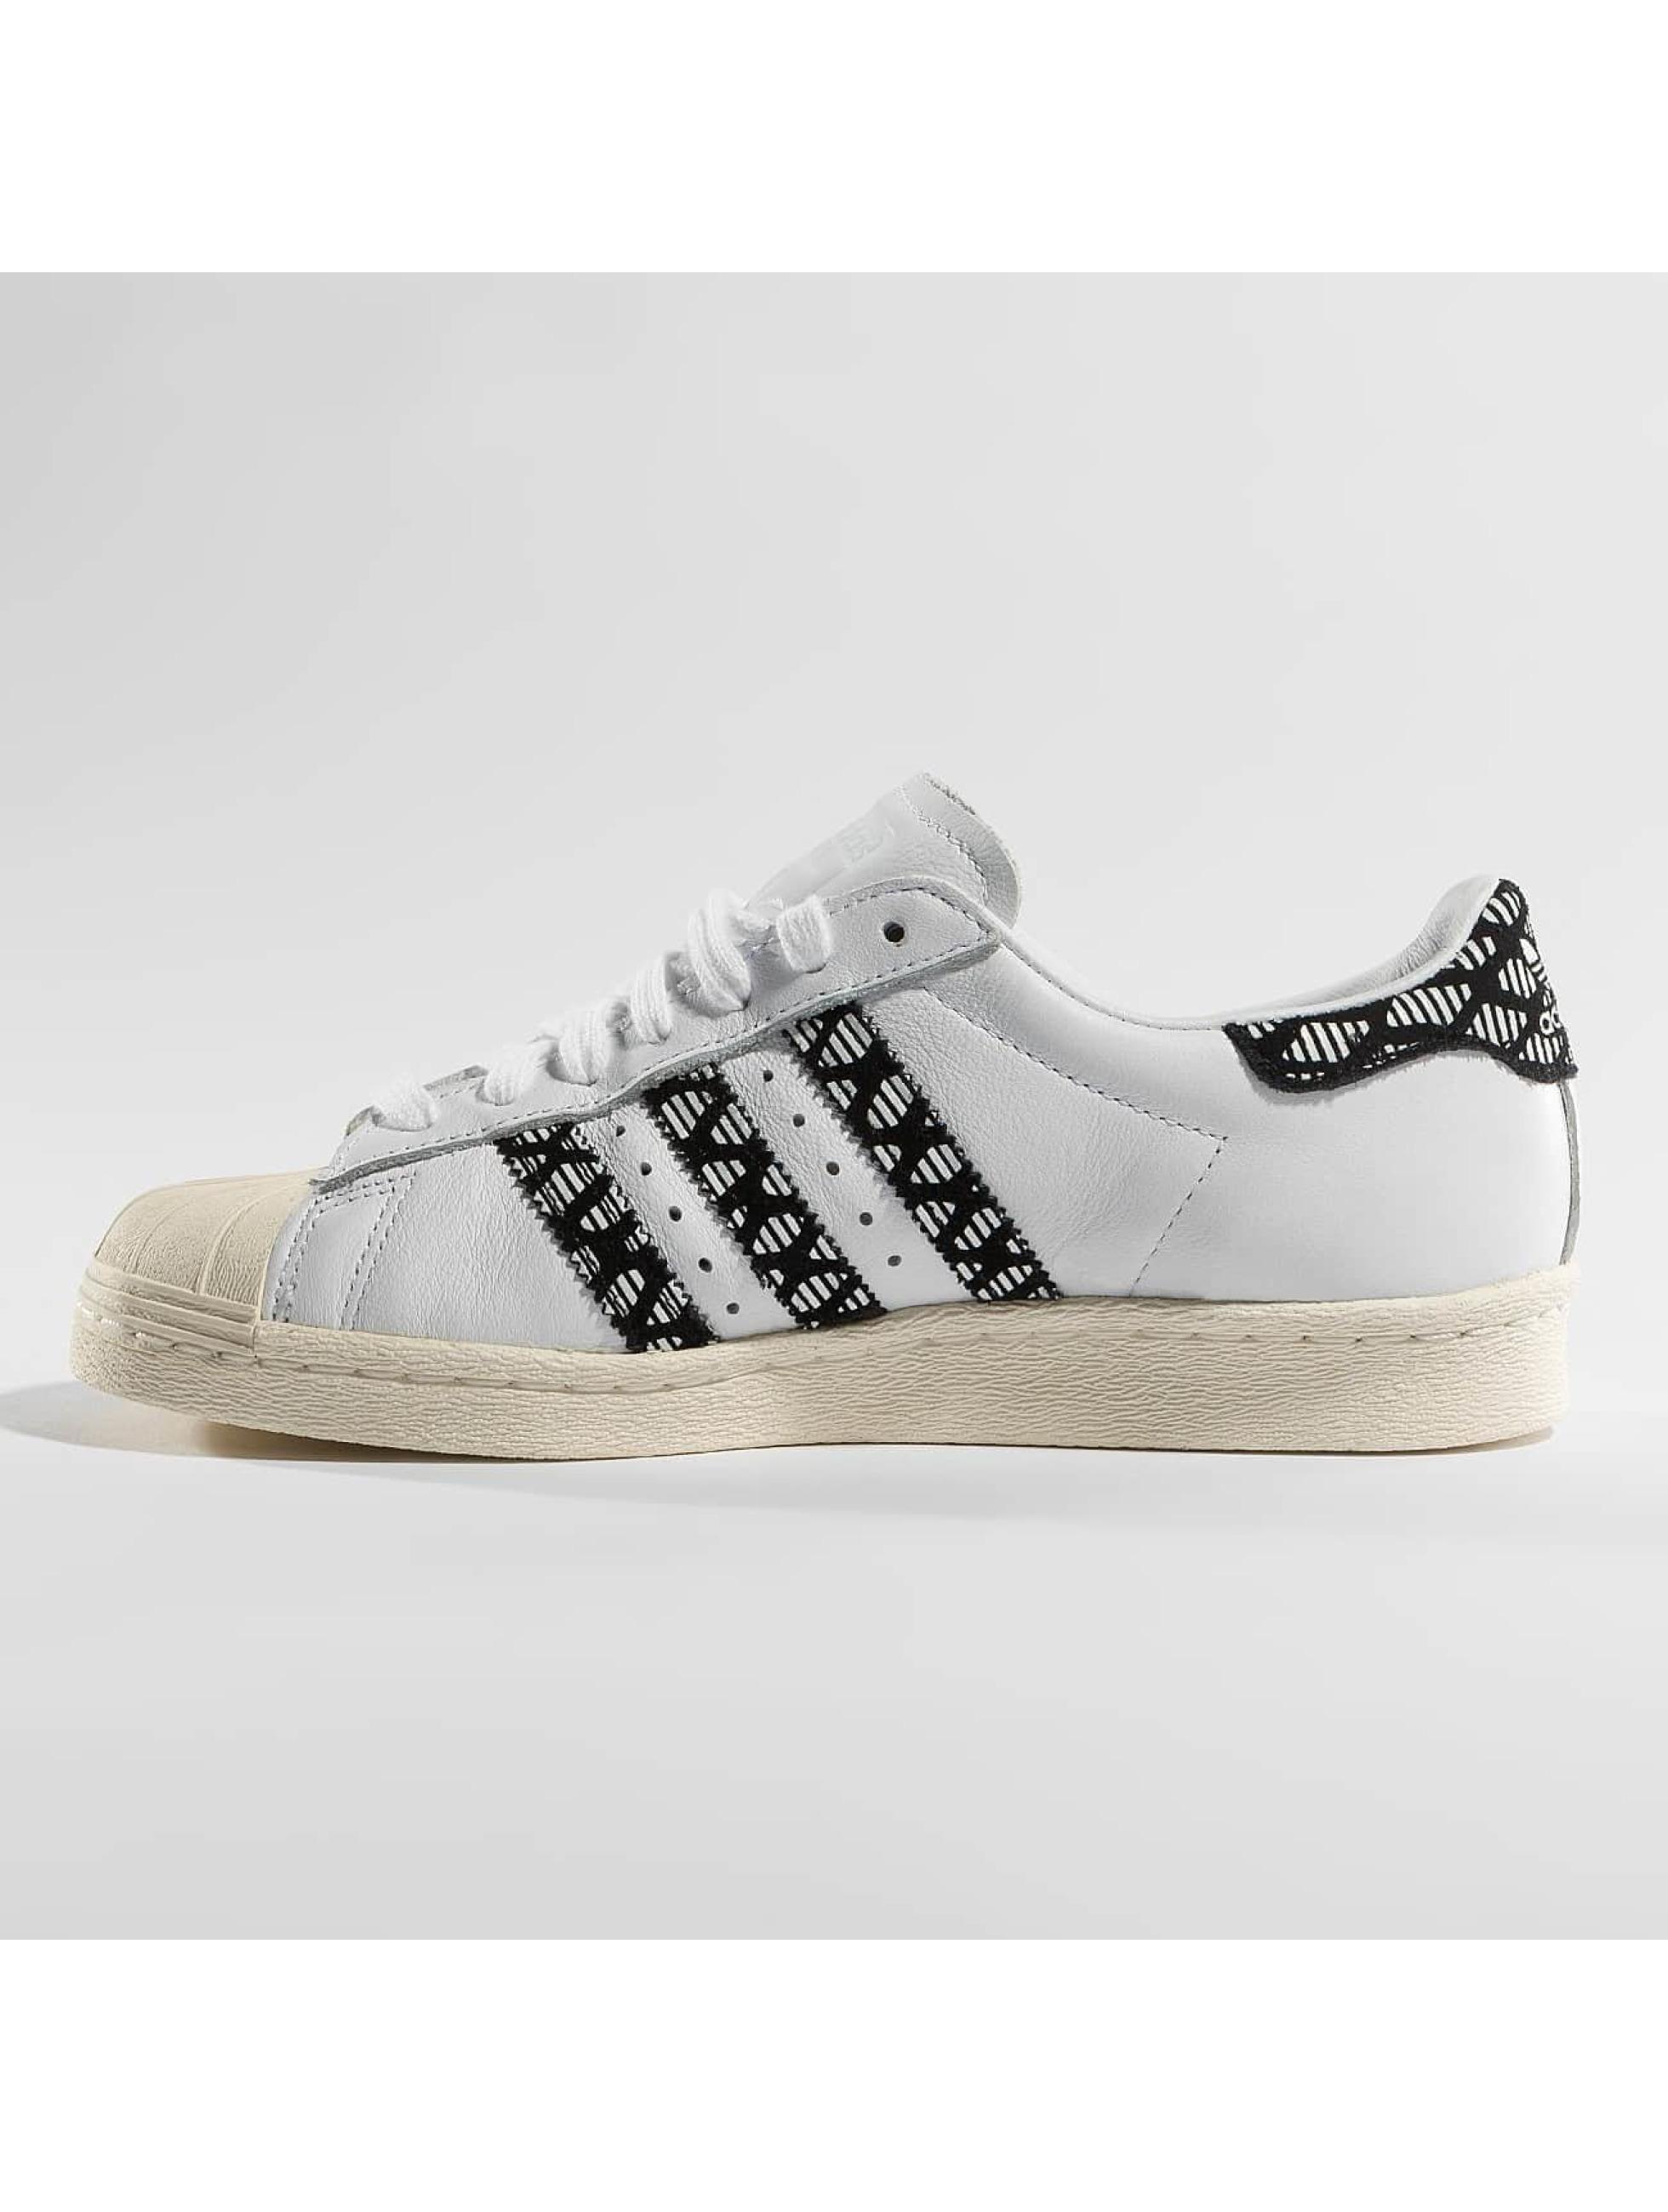 adidas damen schuhe sneaker superstar 80s ebay. Black Bedroom Furniture Sets. Home Design Ideas